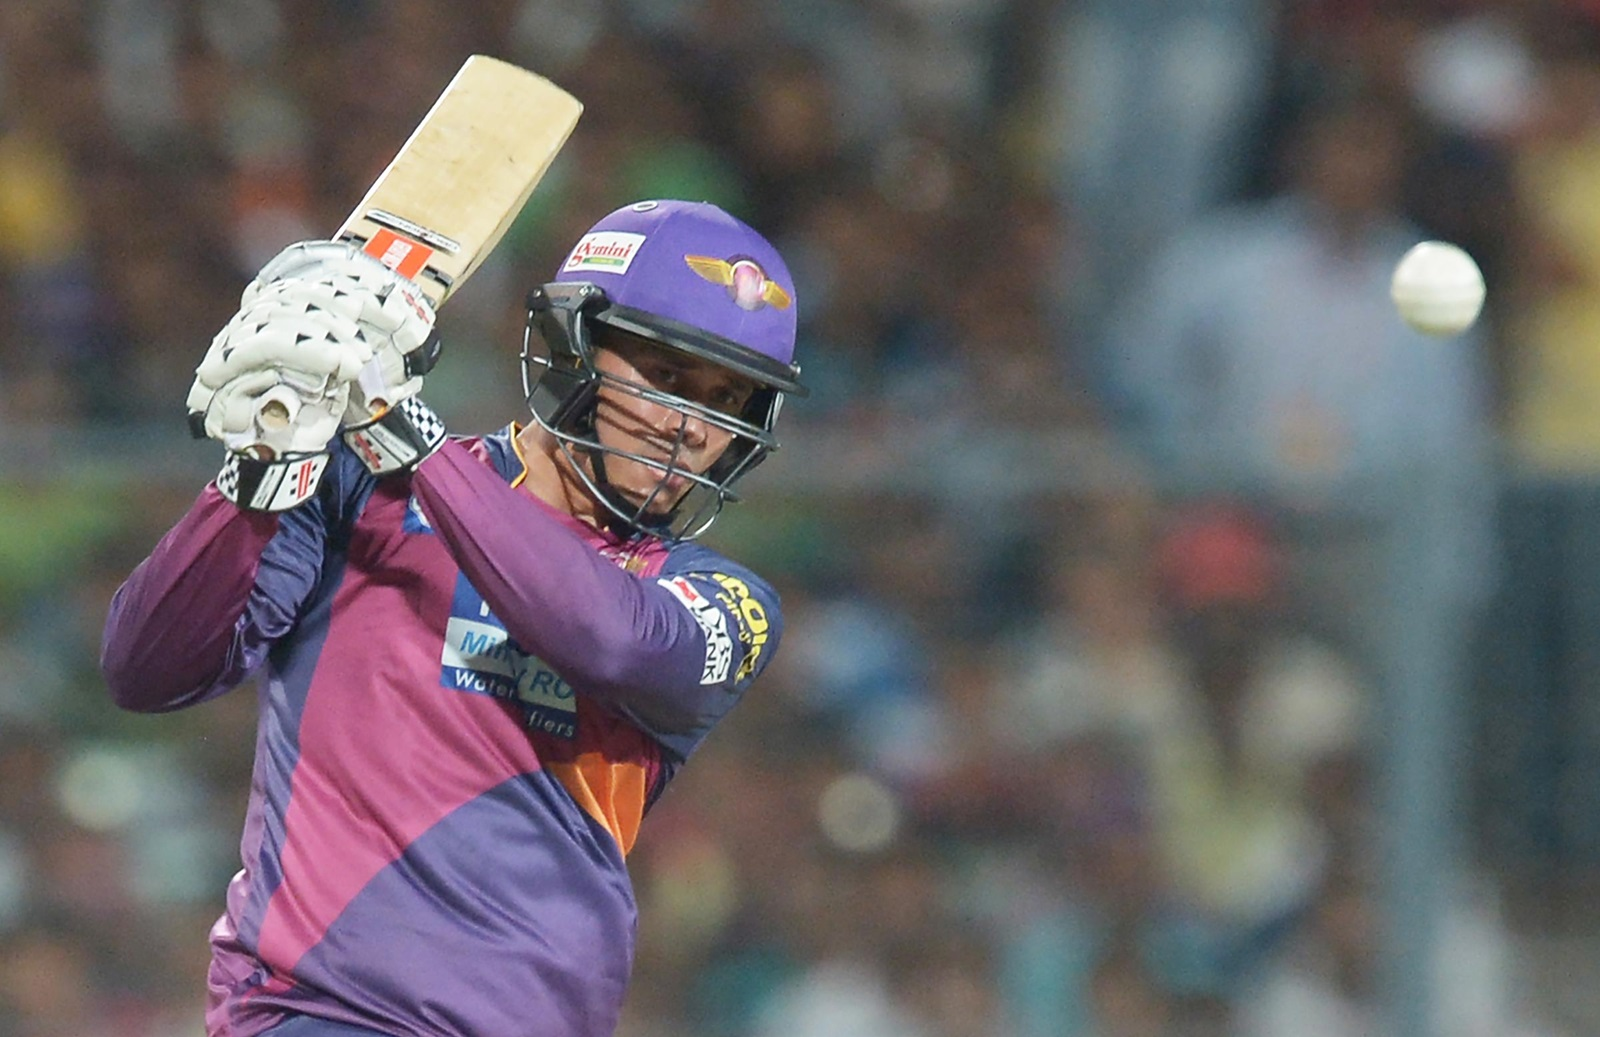 Khawaja's method for Indian success | cricket.com.au